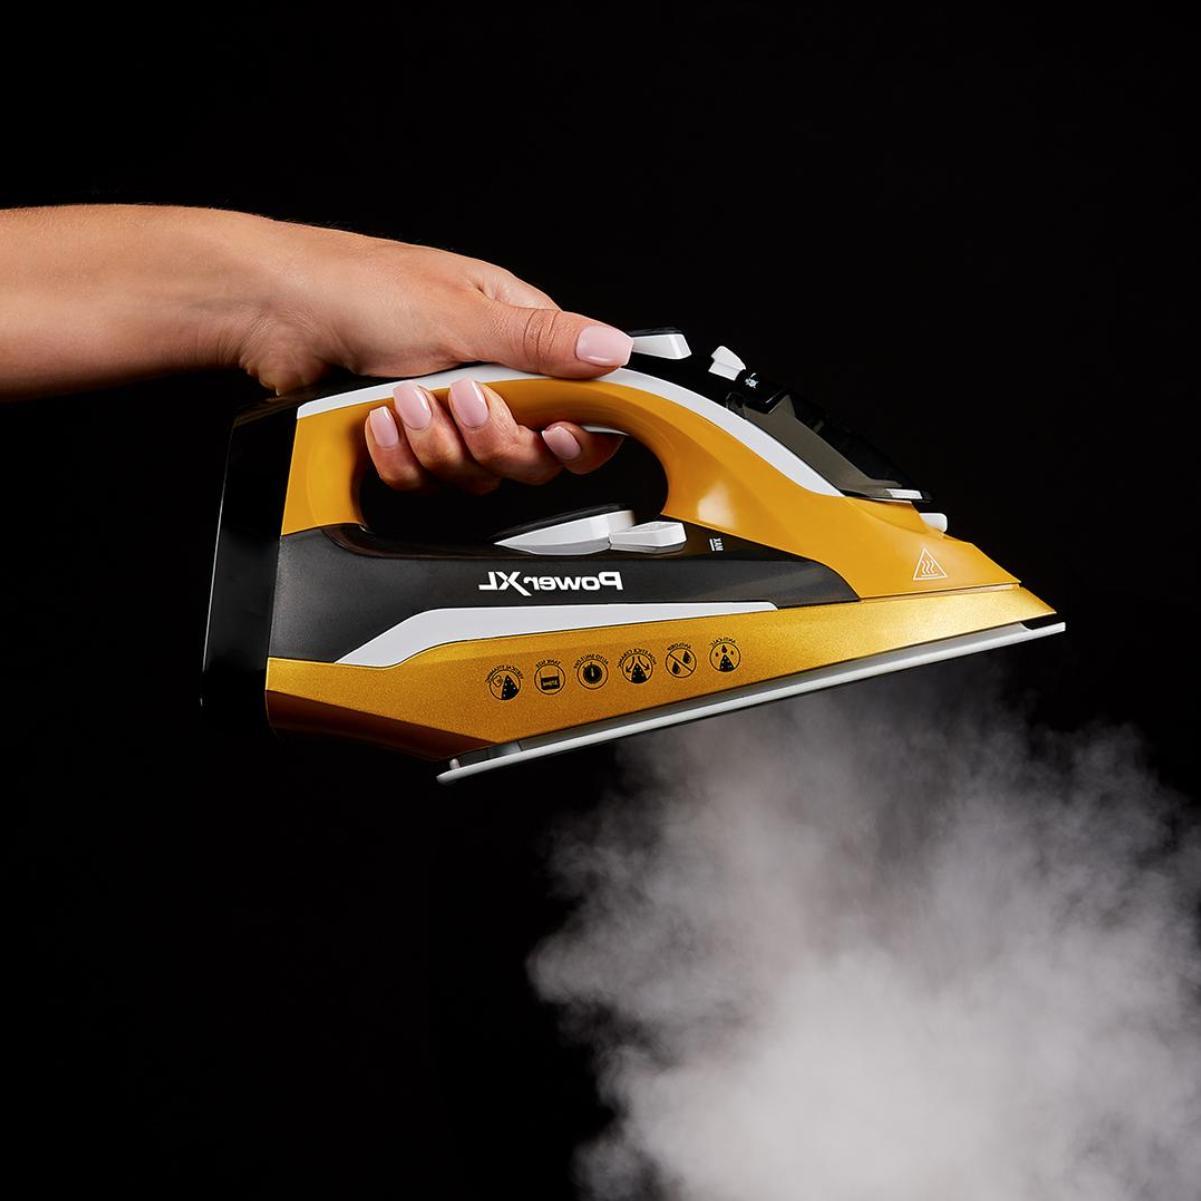 Power Iron & Steamer 2-in-1 Ergonomic Design